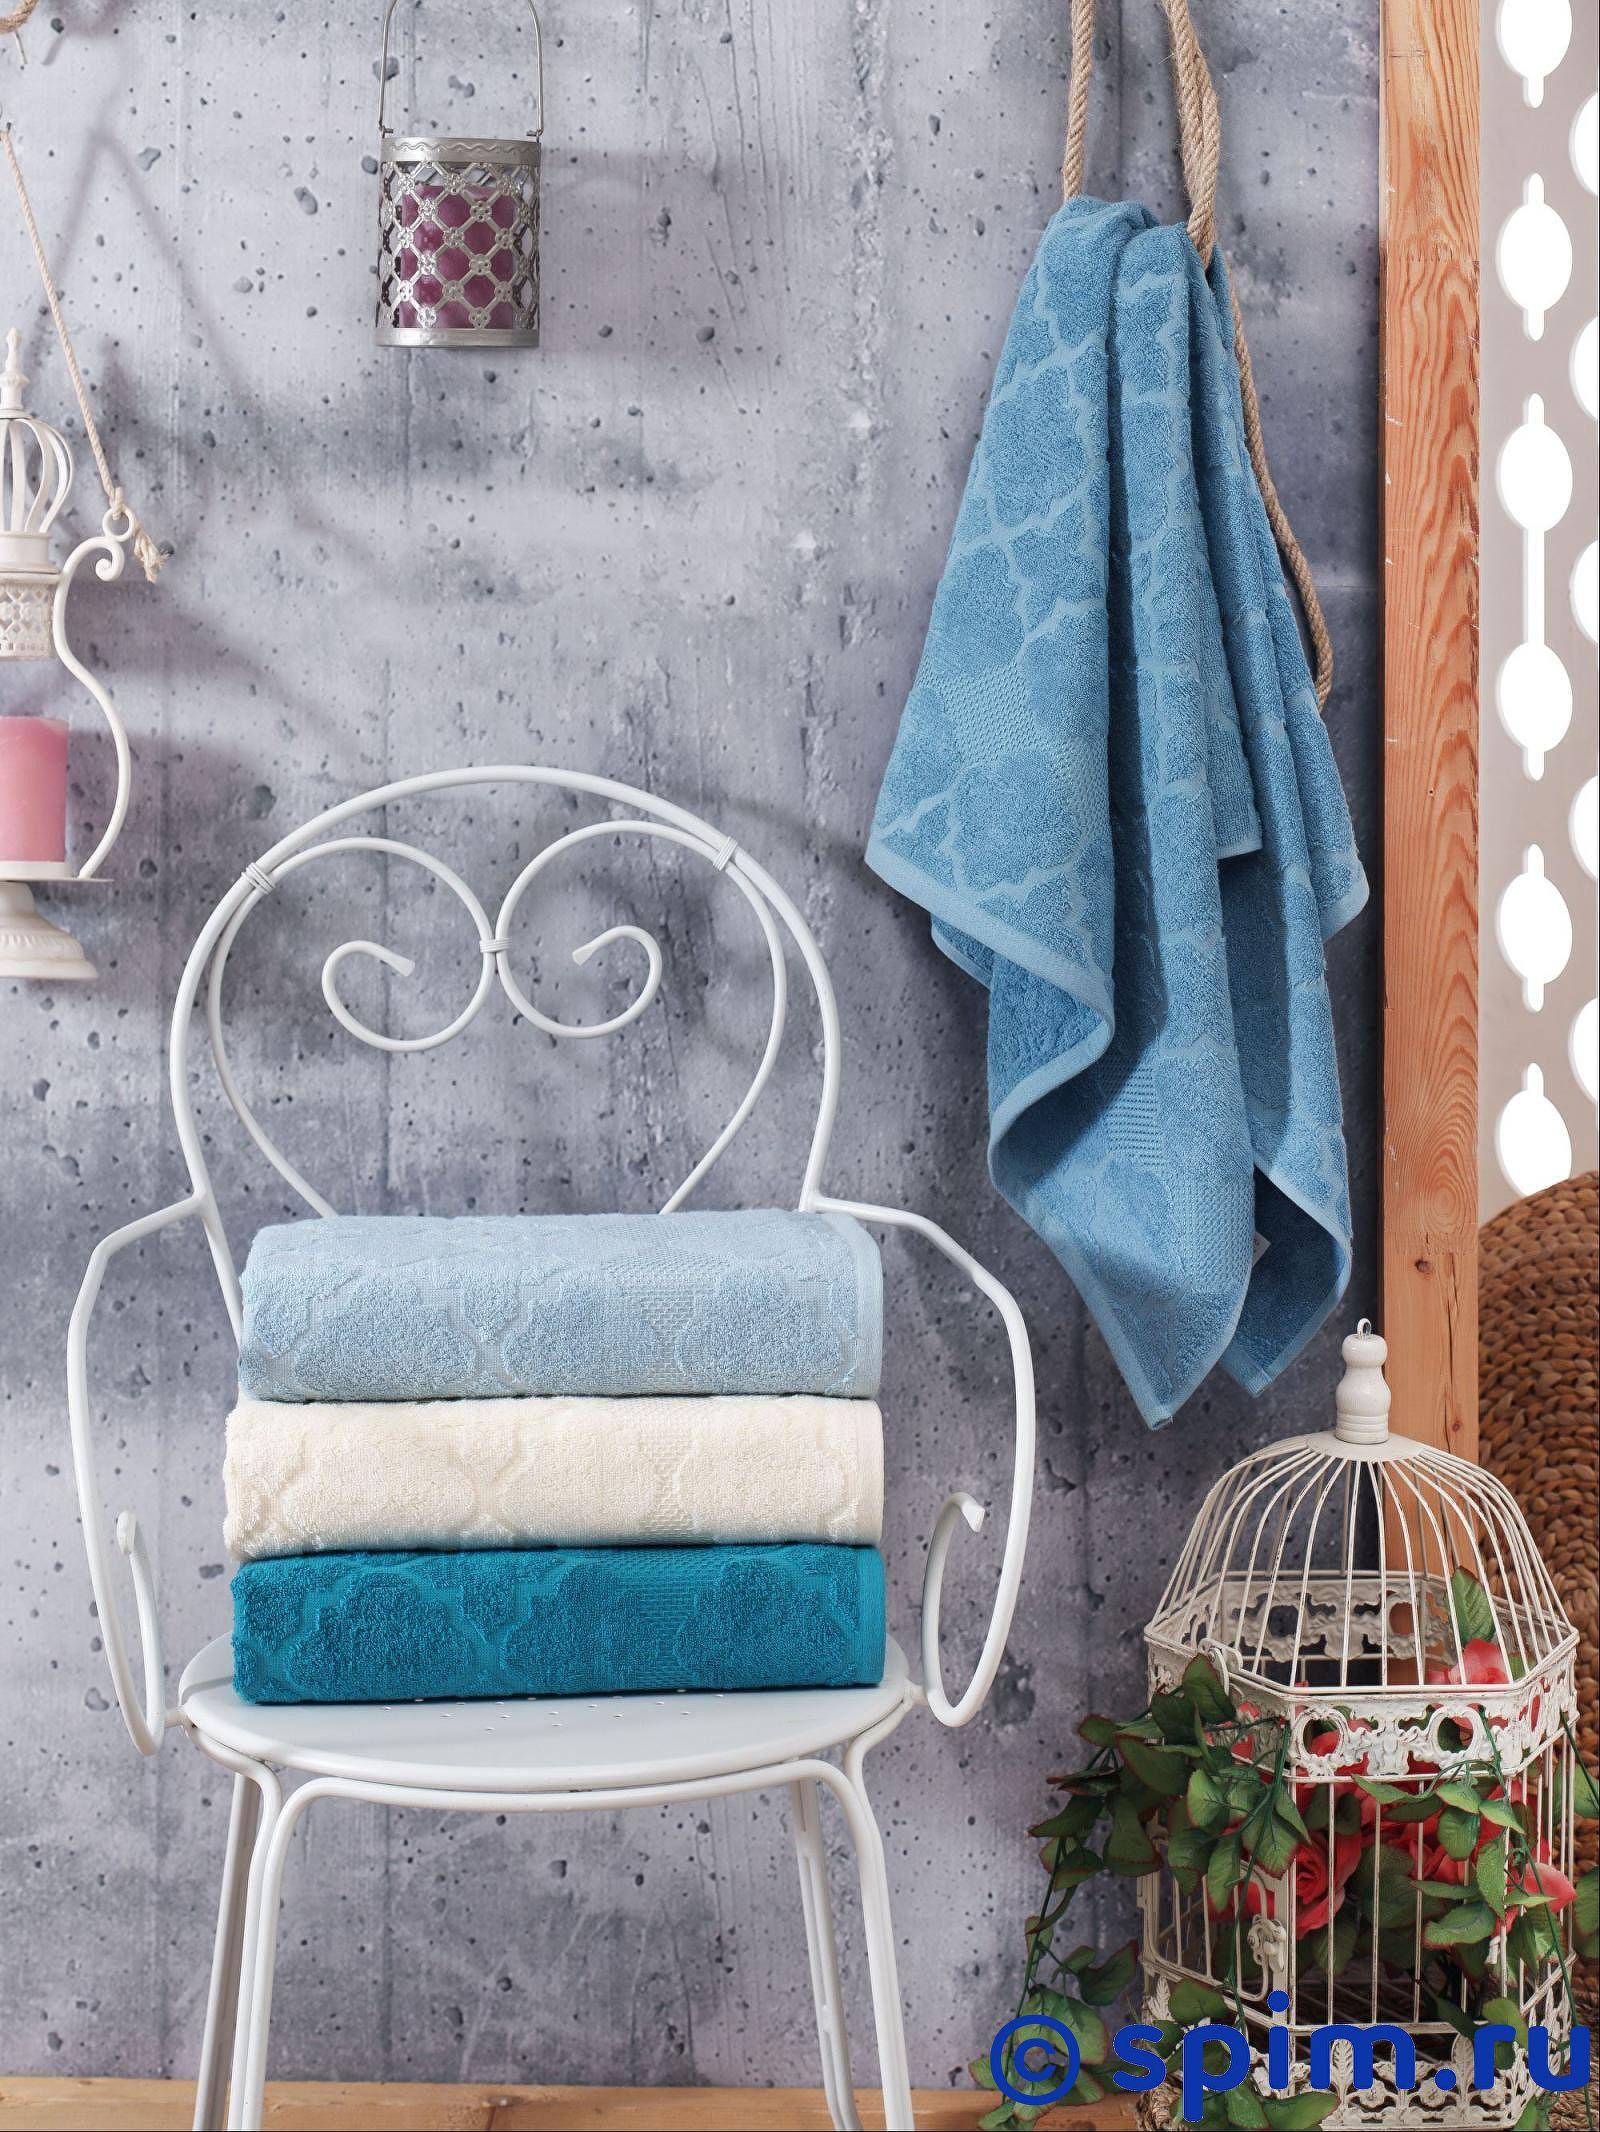 Набор из 4-х полотенец Do&co Crystar 70х140 см полотенца do n co полотенце lady цвет мятный набор